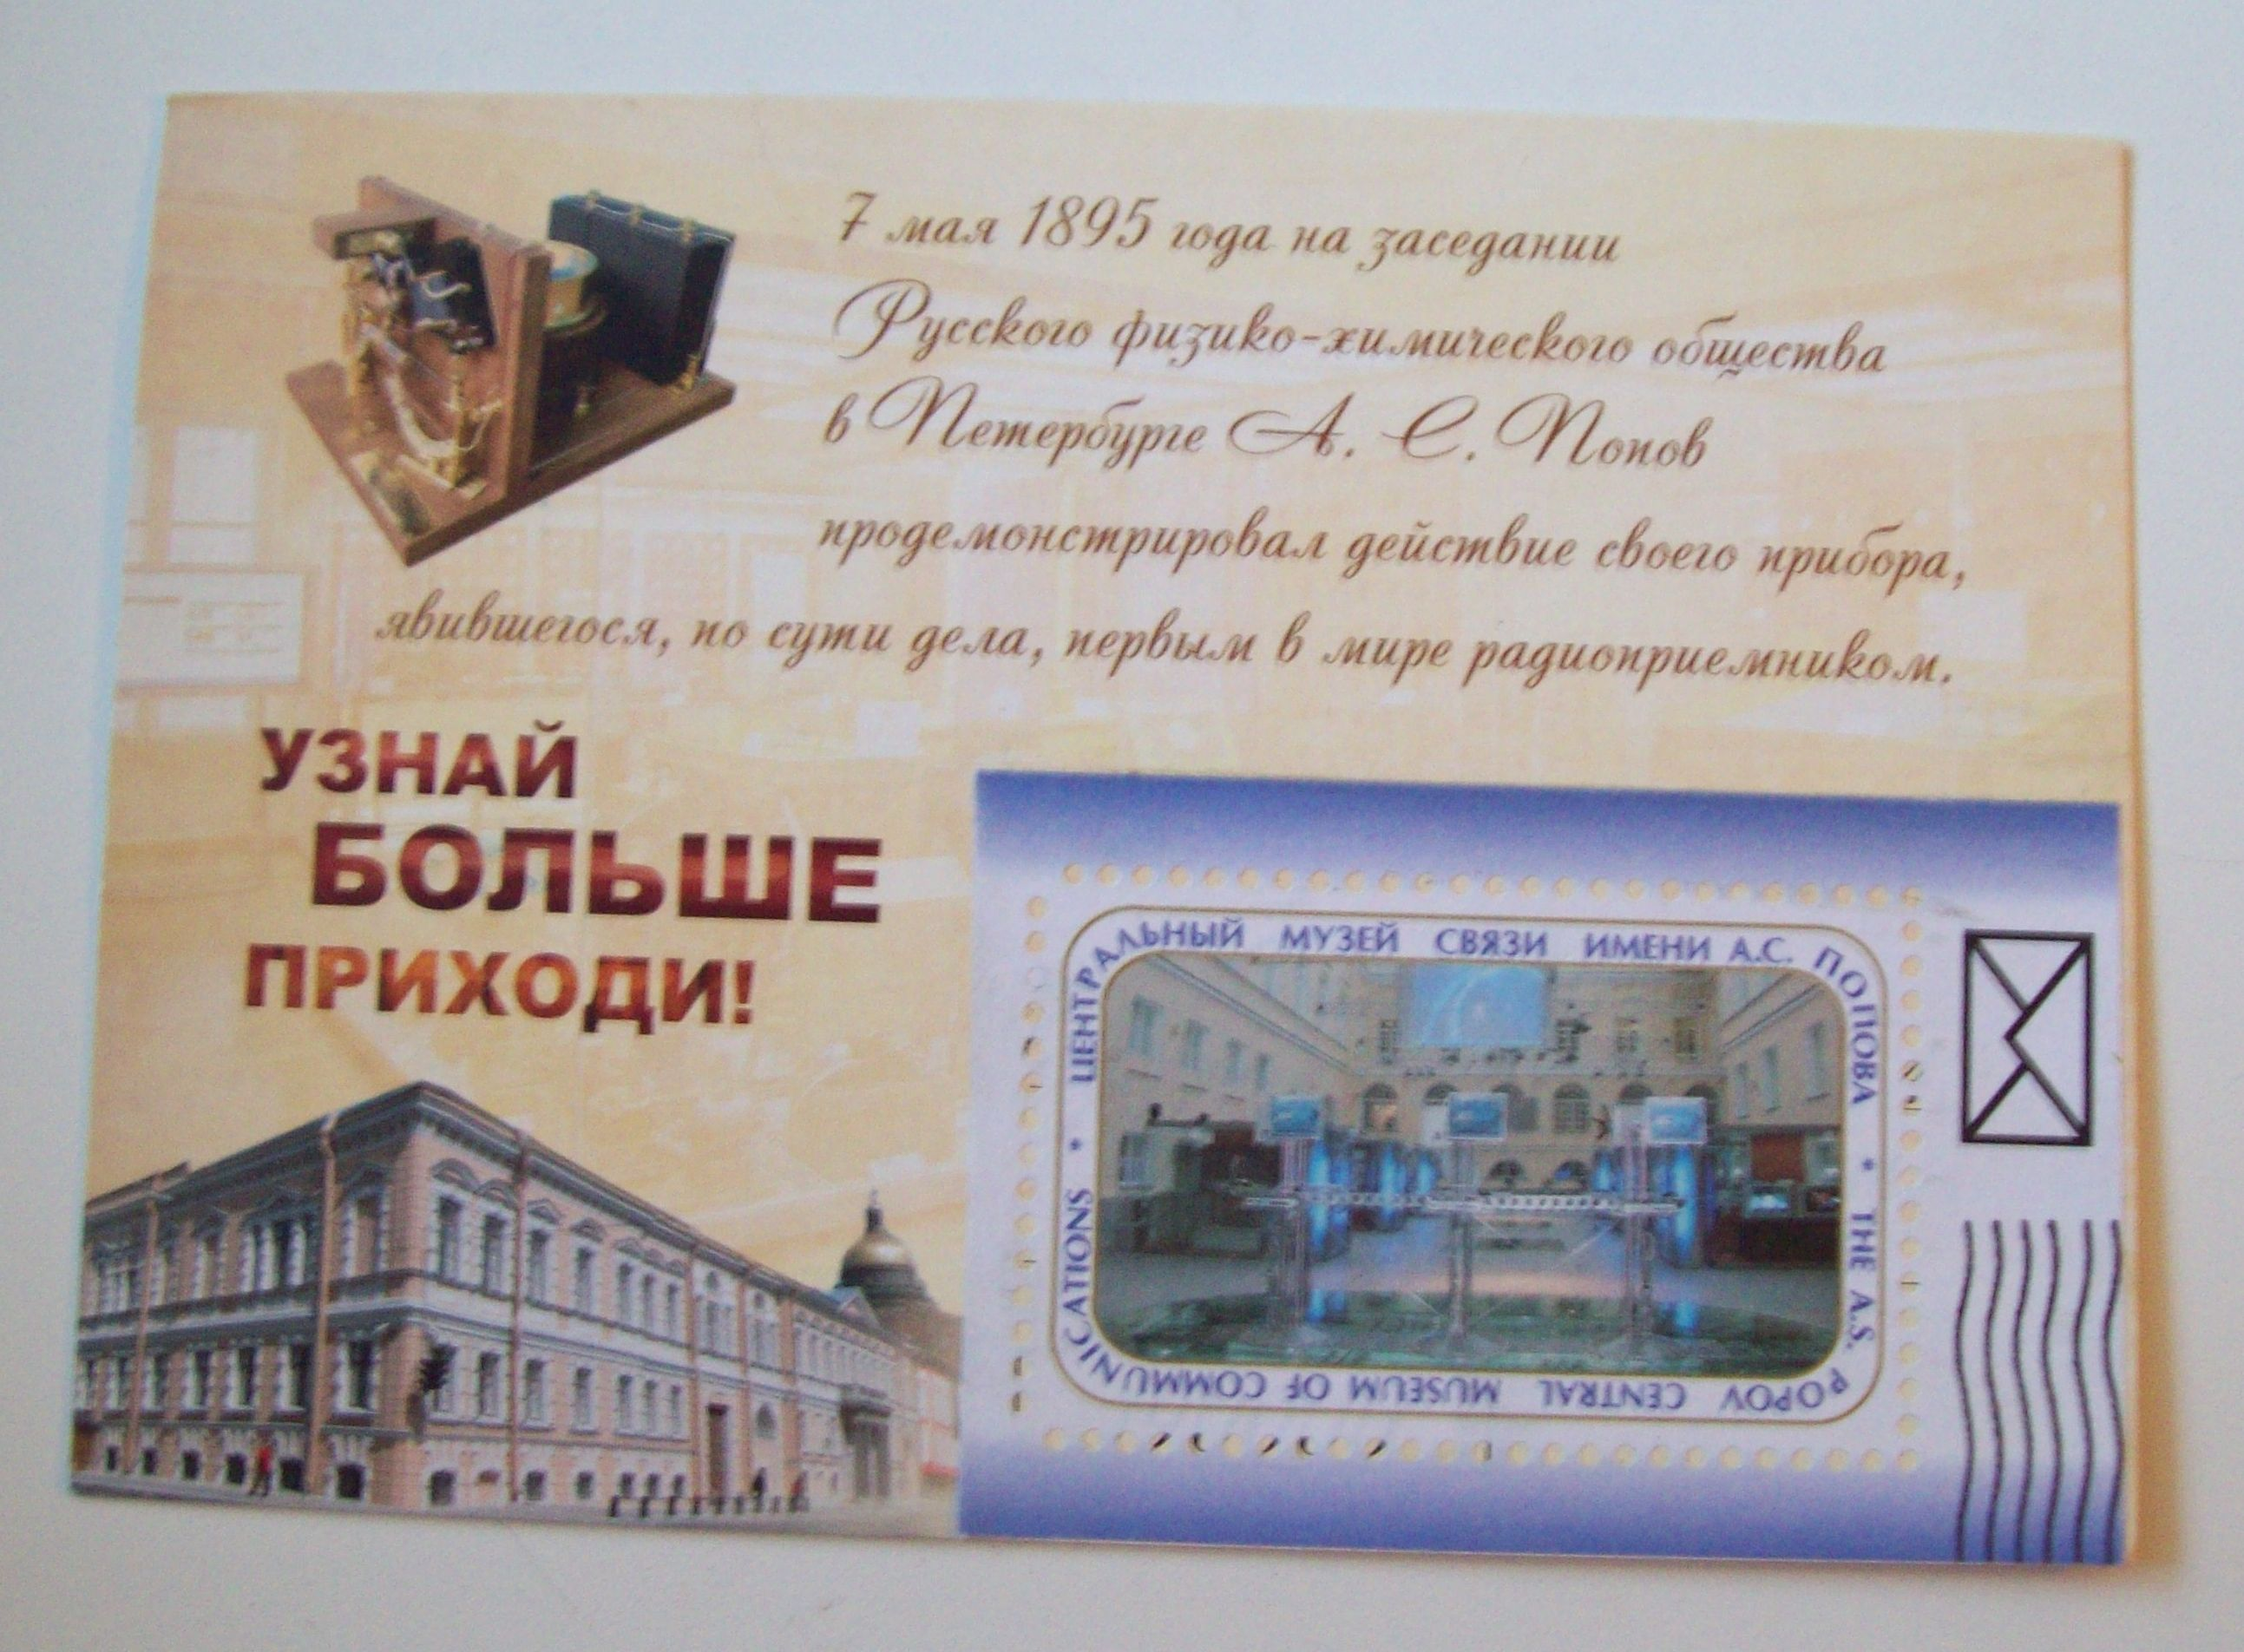 https://img-fotki.yandex.ru/get/198976/272497597.2f/0_3c47f0_f8e88a6_orig.jpg